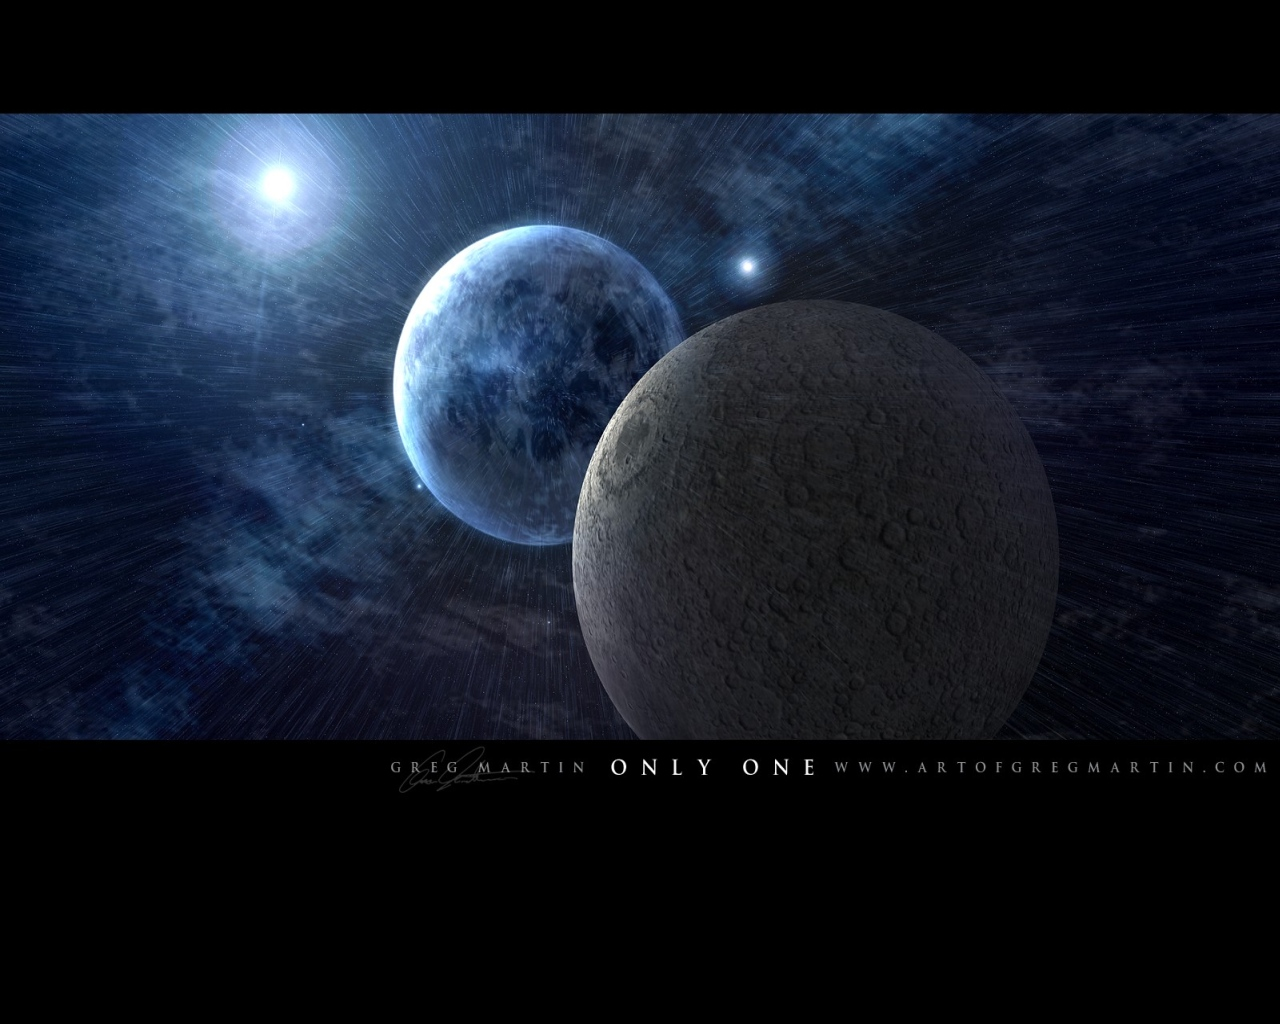 greg martin pneuma nebula - photo #22